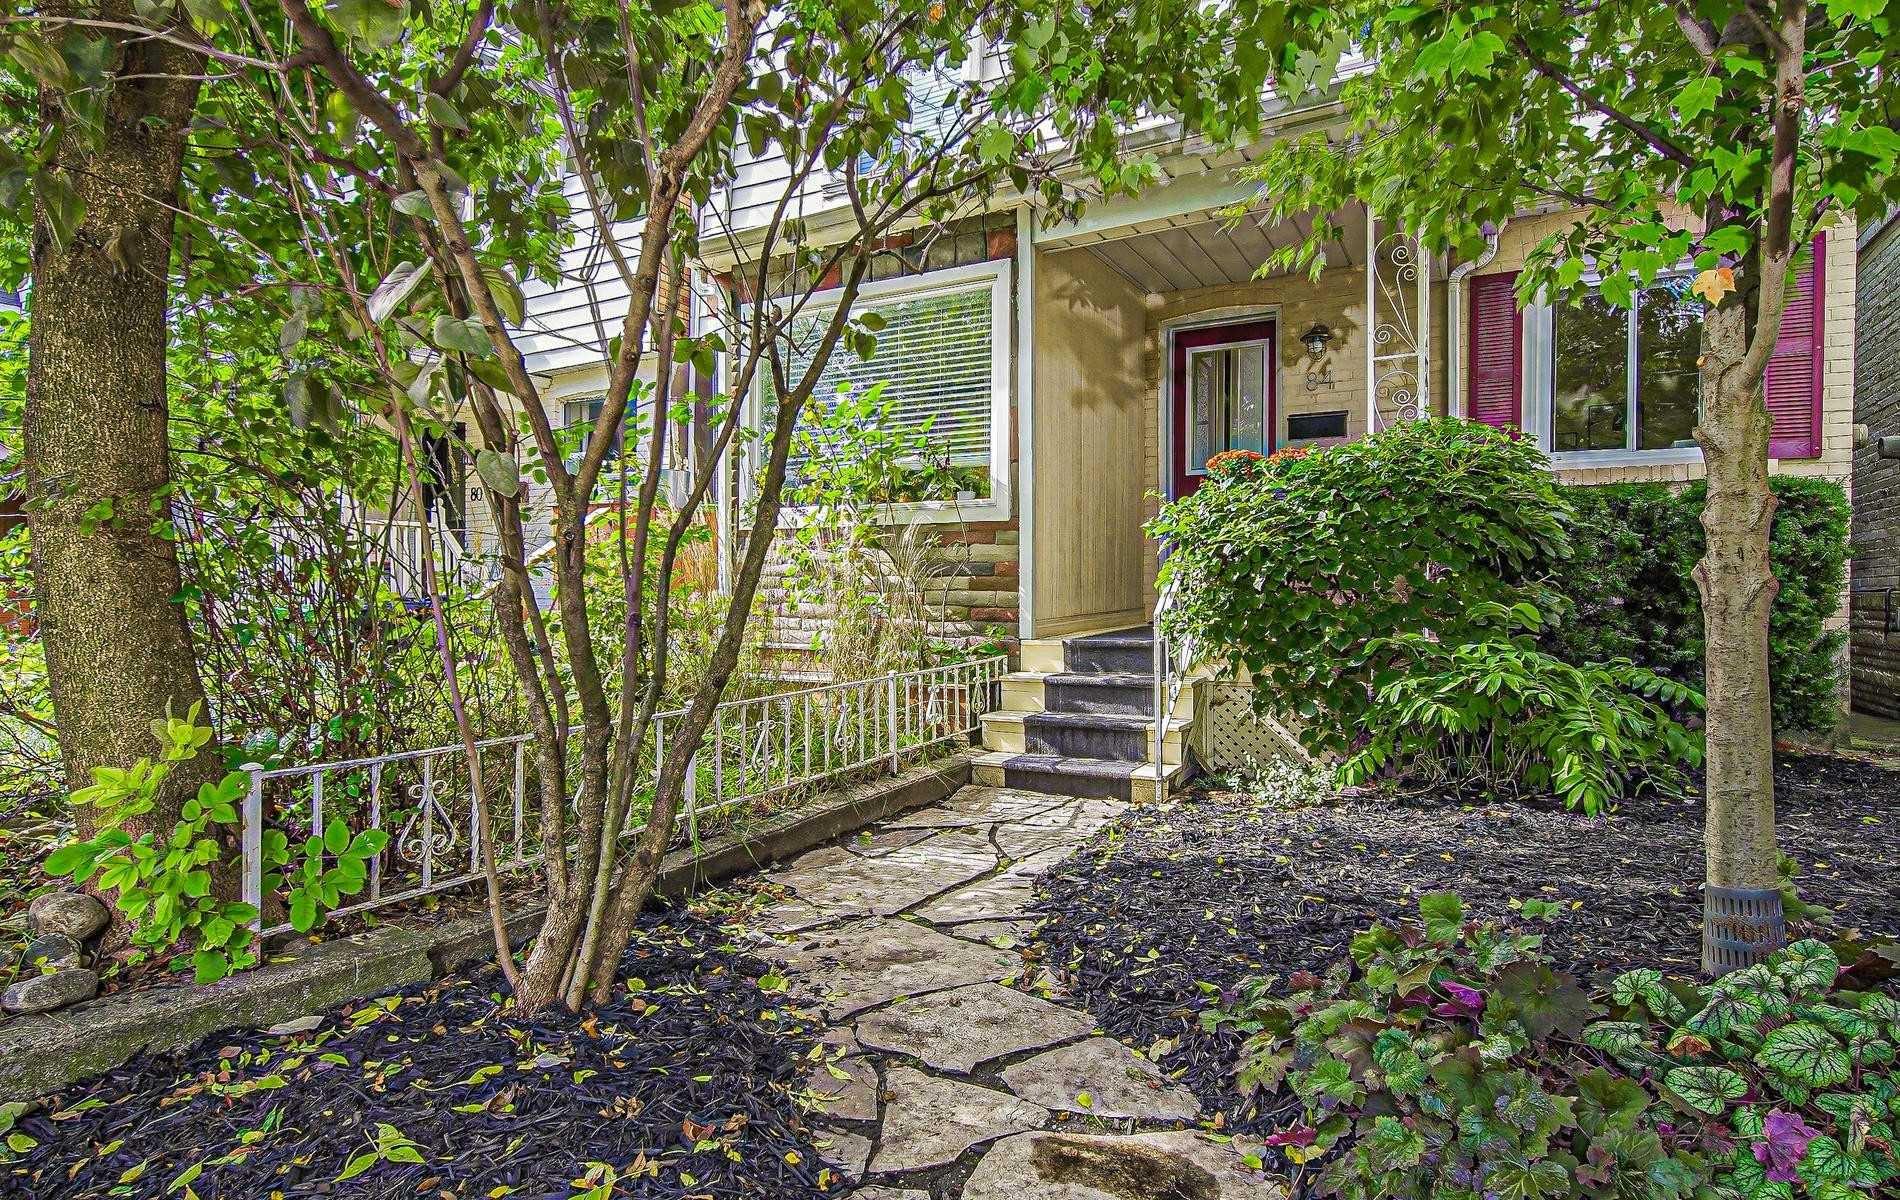 Photo 17: Photos: 84 Rushbrooke Avenue in Toronto: South Riverdale House (2-Storey) for sale (Toronto E01)  : MLS®# E4600791